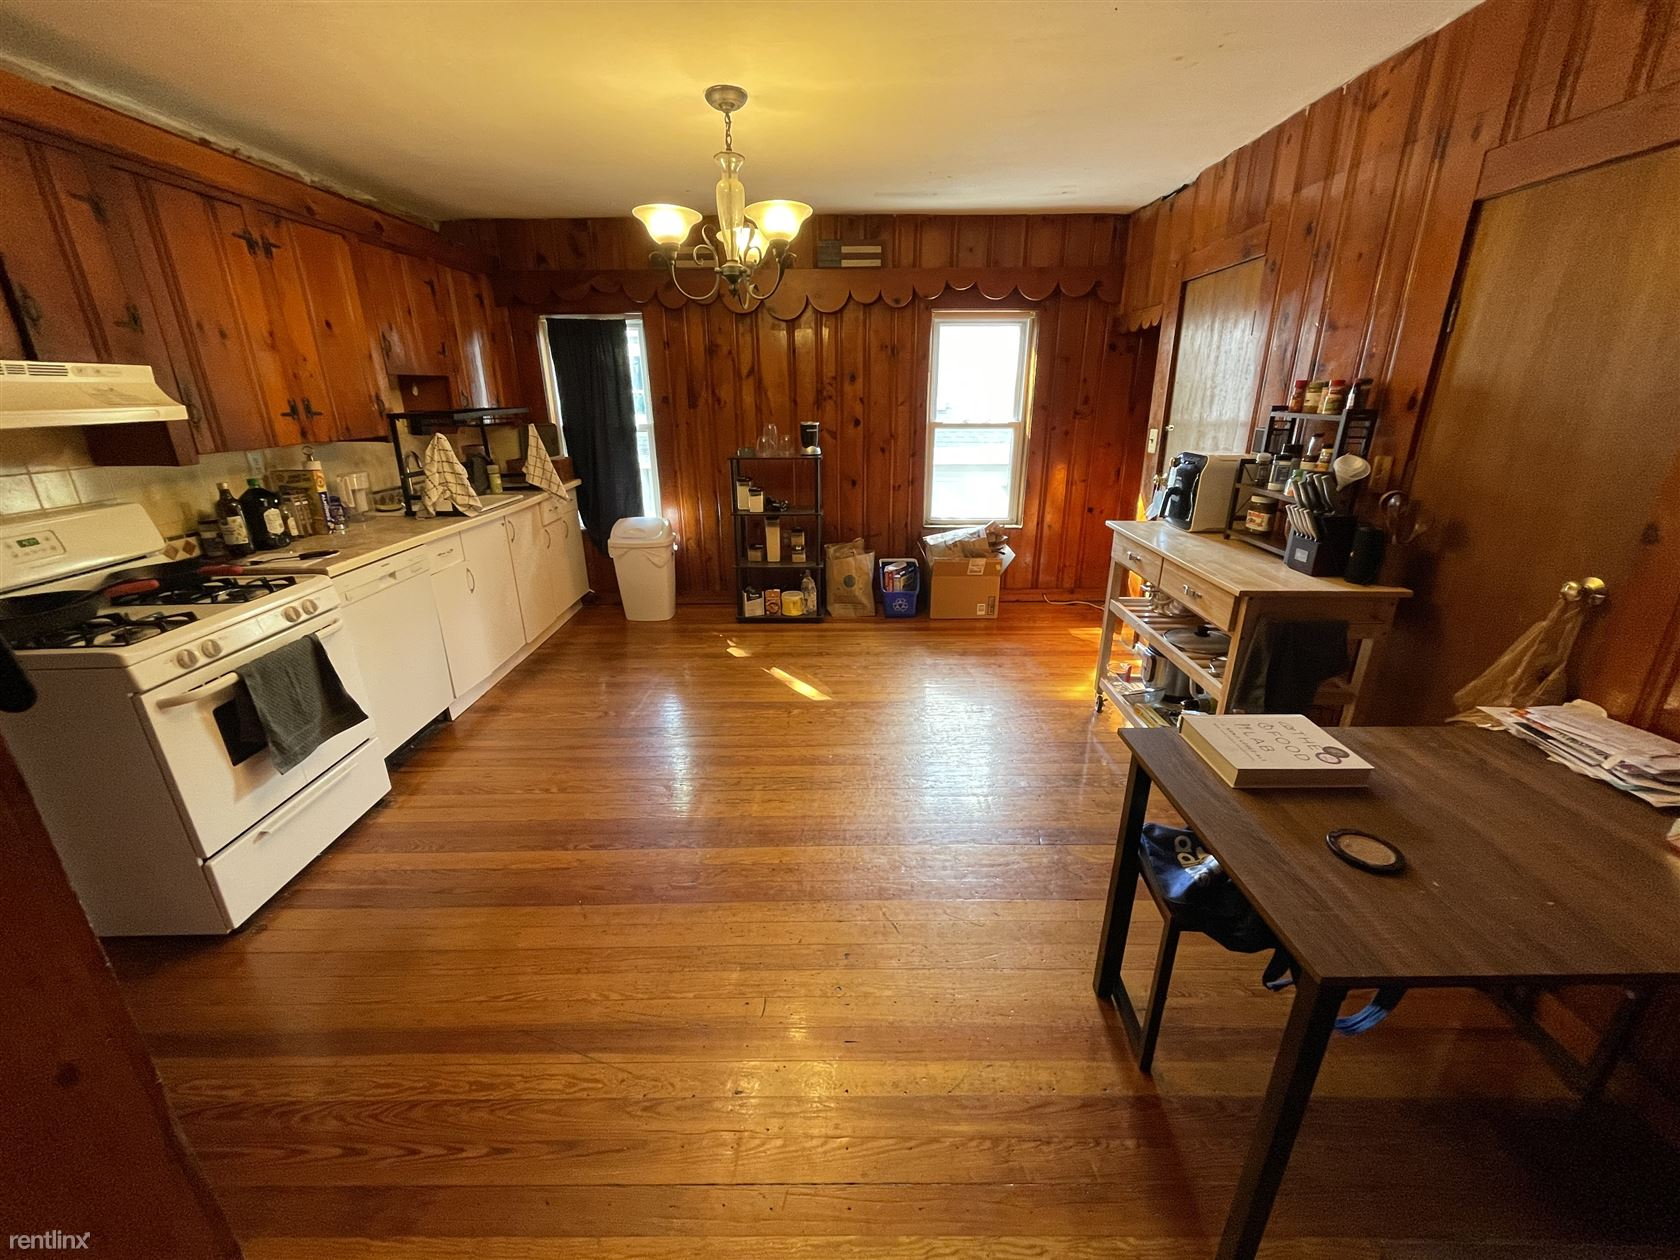 44 Benton Road, Somerville, MA - $2,450 USD/ month